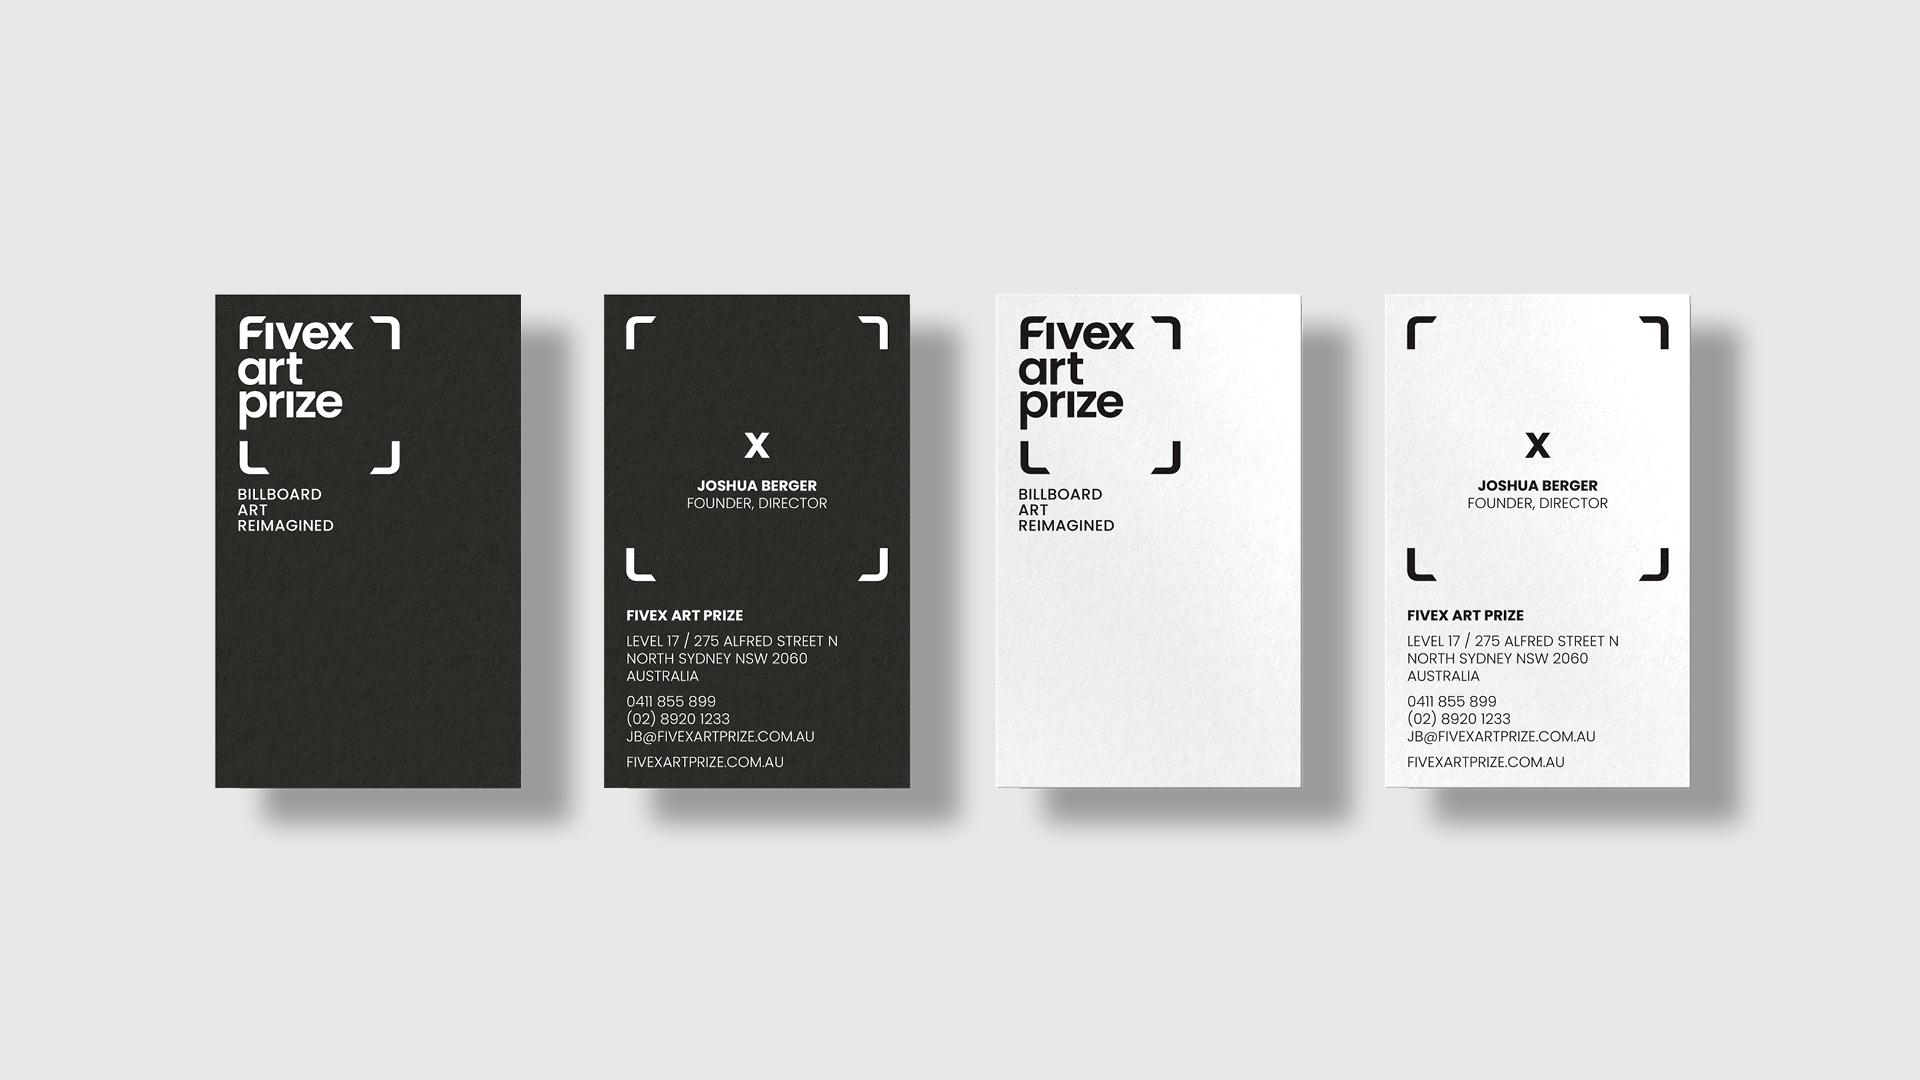 Five X Art Prize branding